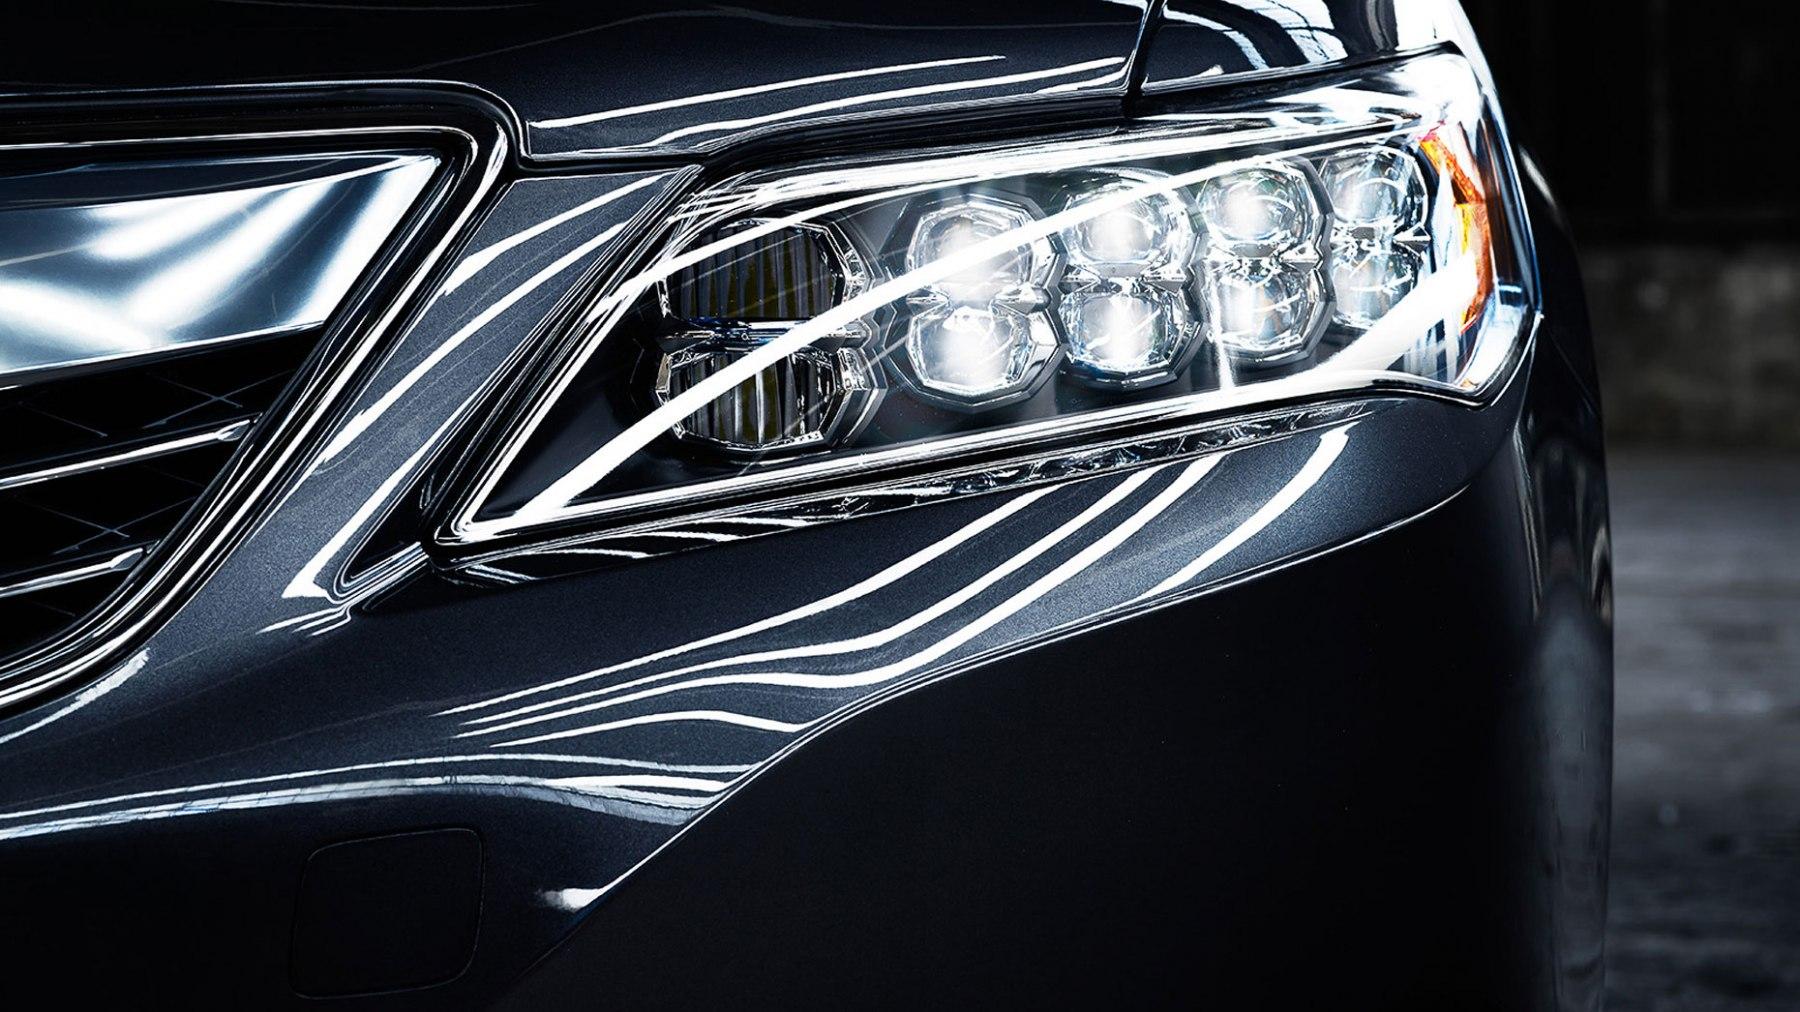 R_14RLX_Adv_Hanger-Beauty_Graphite_Headlight_Detail_w1g